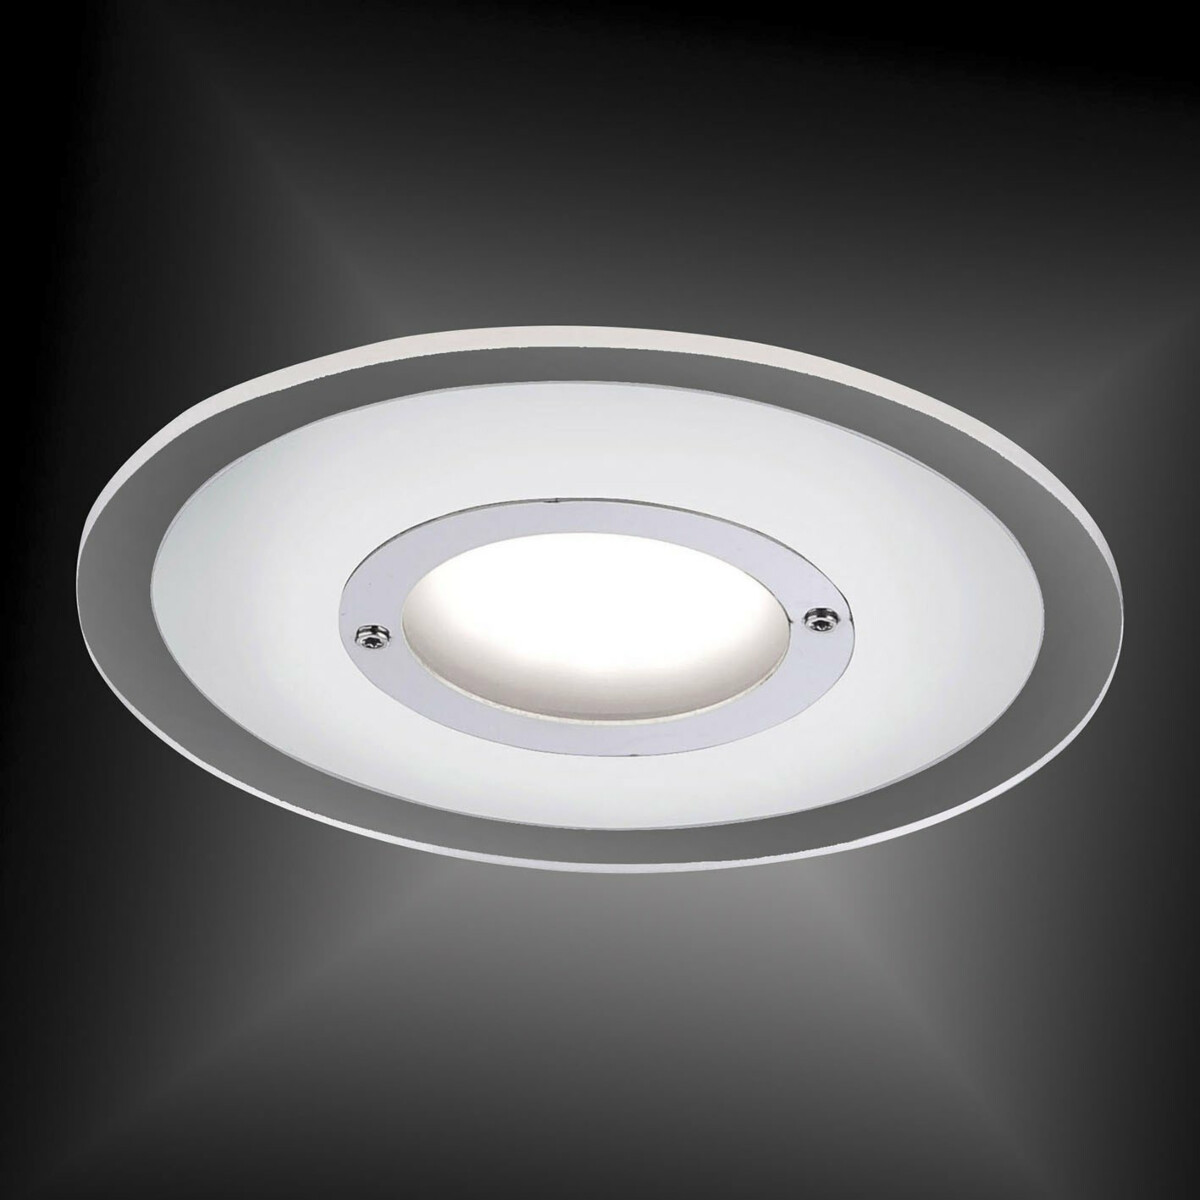 LED-alasvalot, LED-paneelit, plafondit ja LED-spotit: